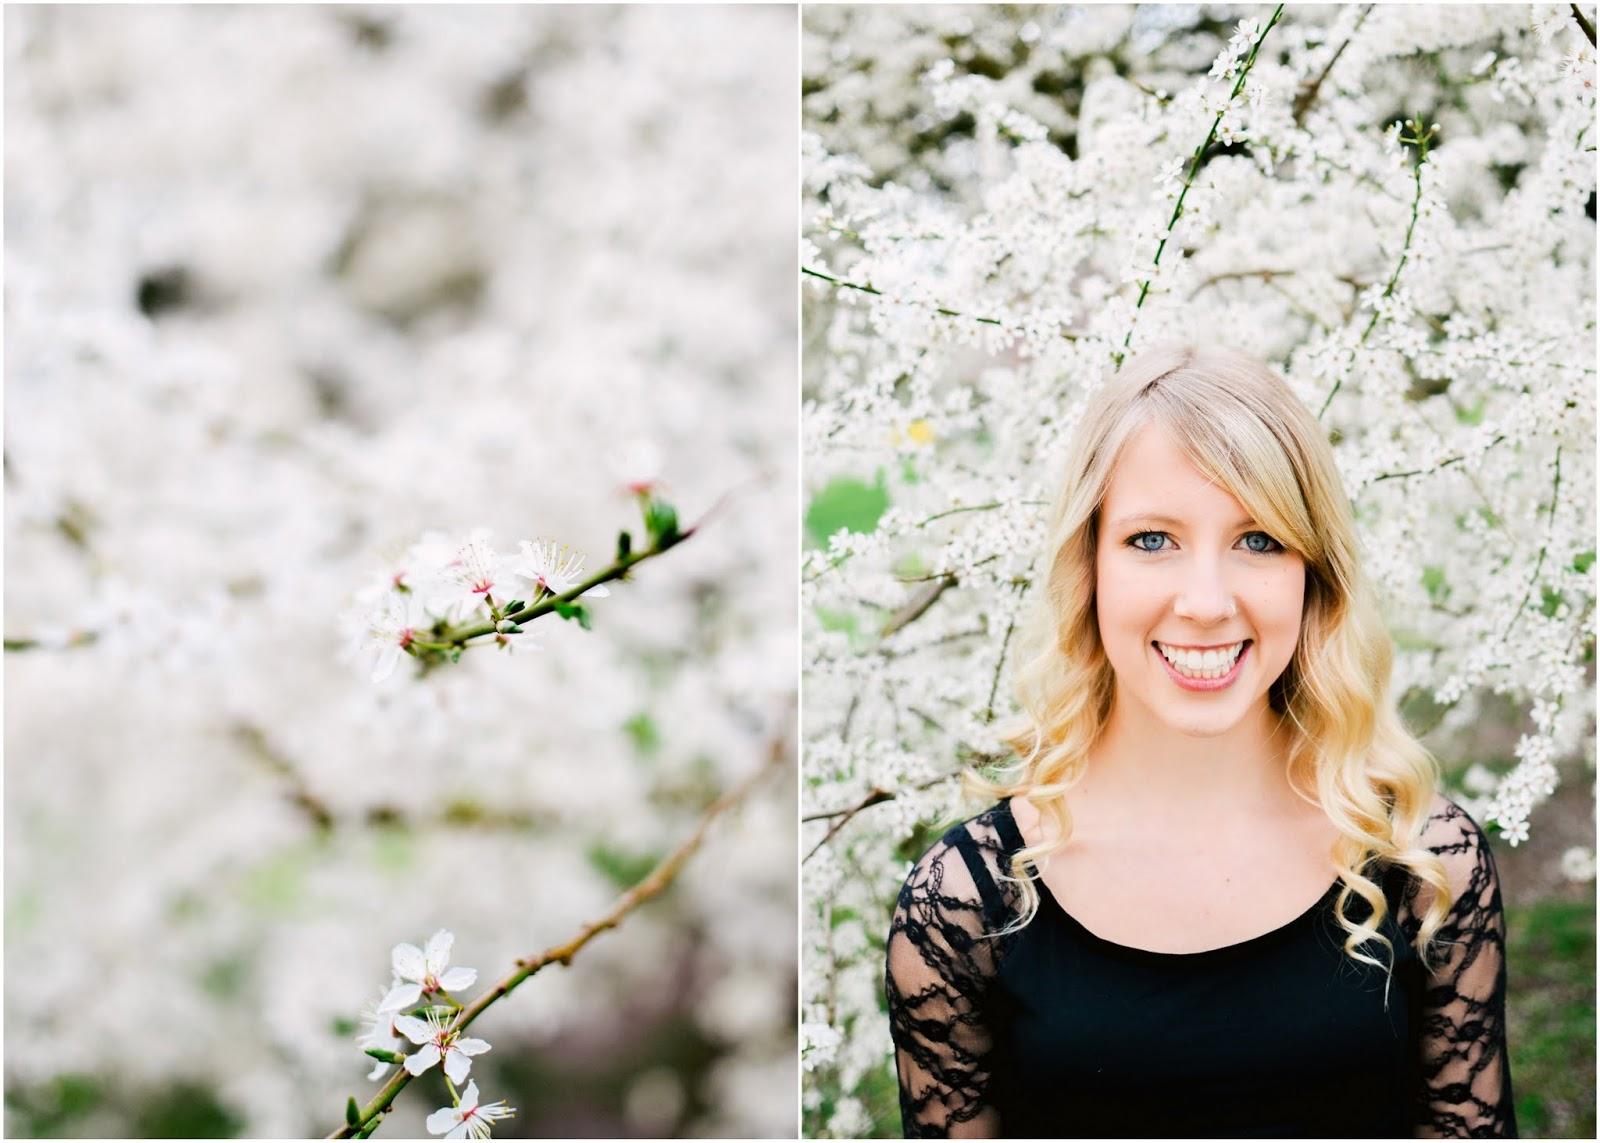 april+blossoms2-002.jpg